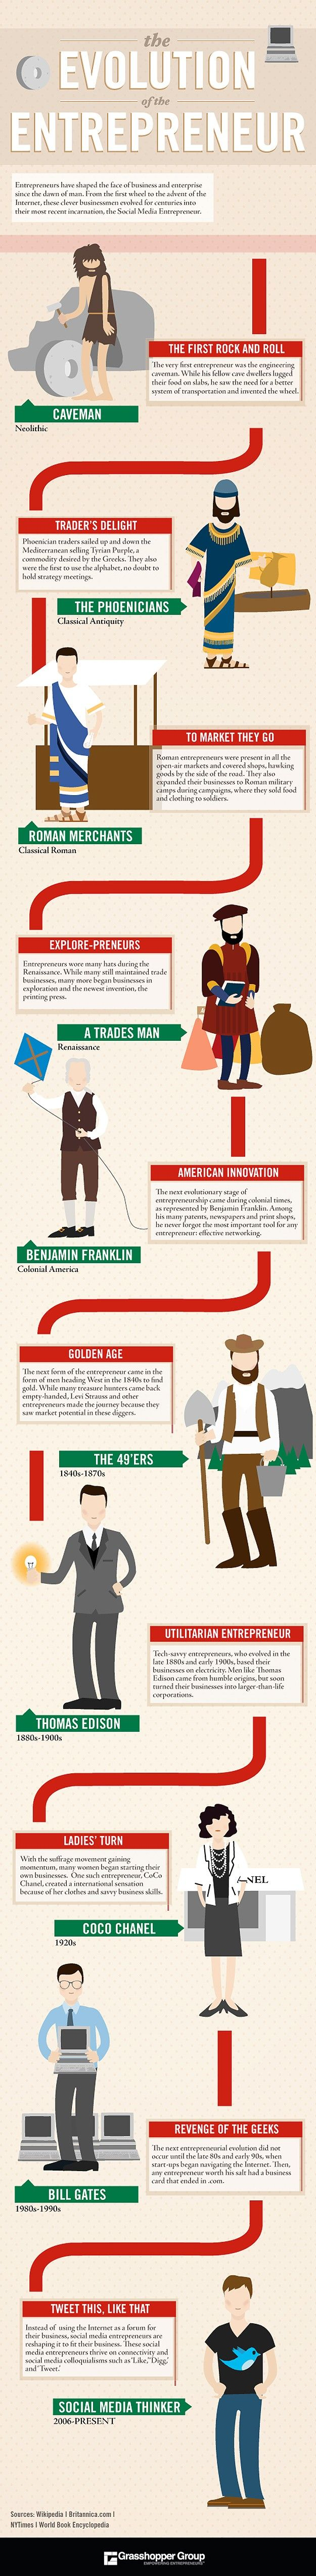 The infographic poster talks about evolution of entrepreneurship.   http://blog.hepcatsmarketing.com/